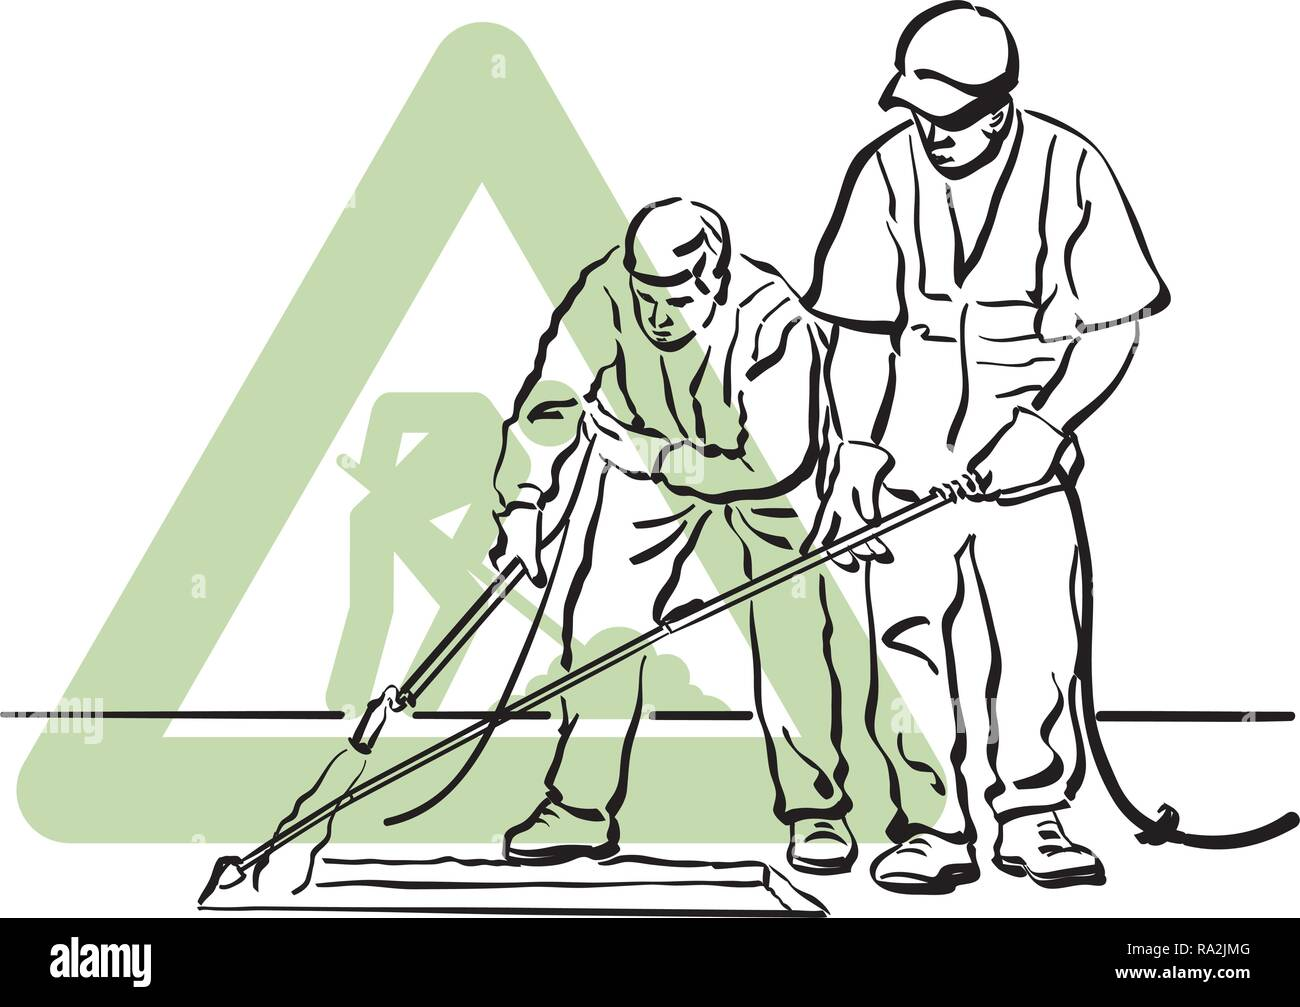 A pair of asphalt workers leveling the freshly laid asphalt. - Stock Vector